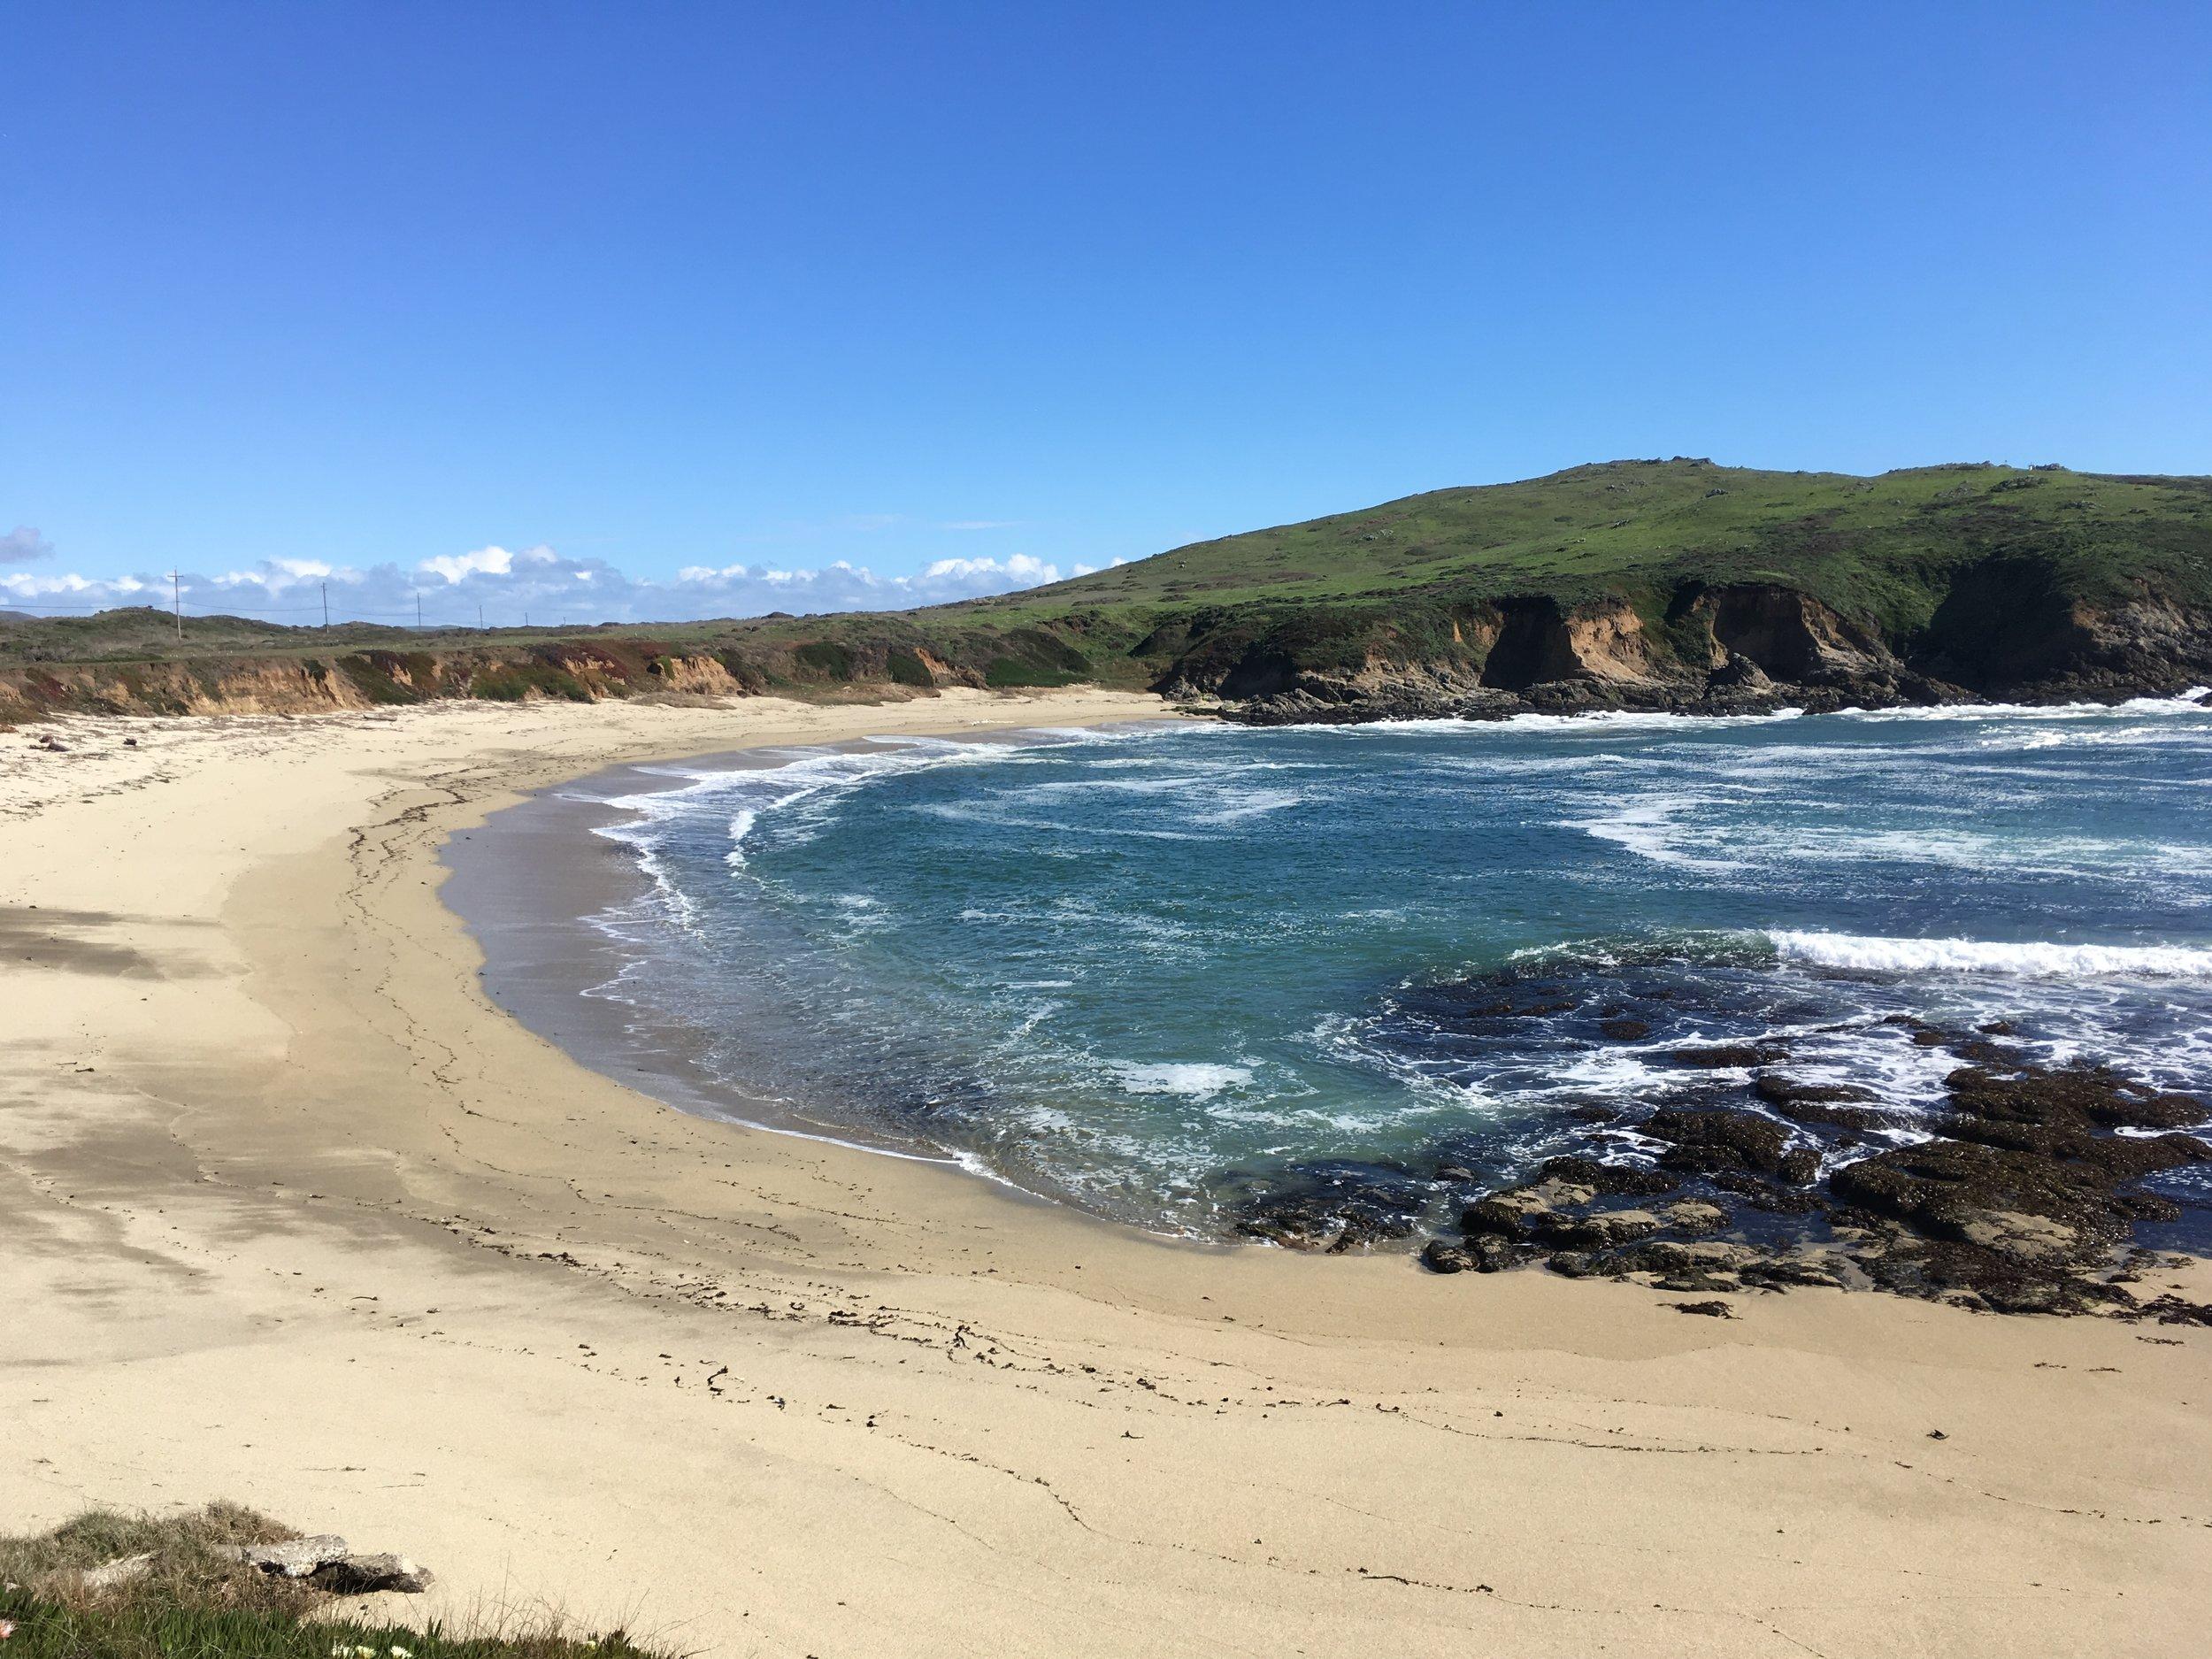 Bodega Marine Reserve. Photo credit: Lais Lima